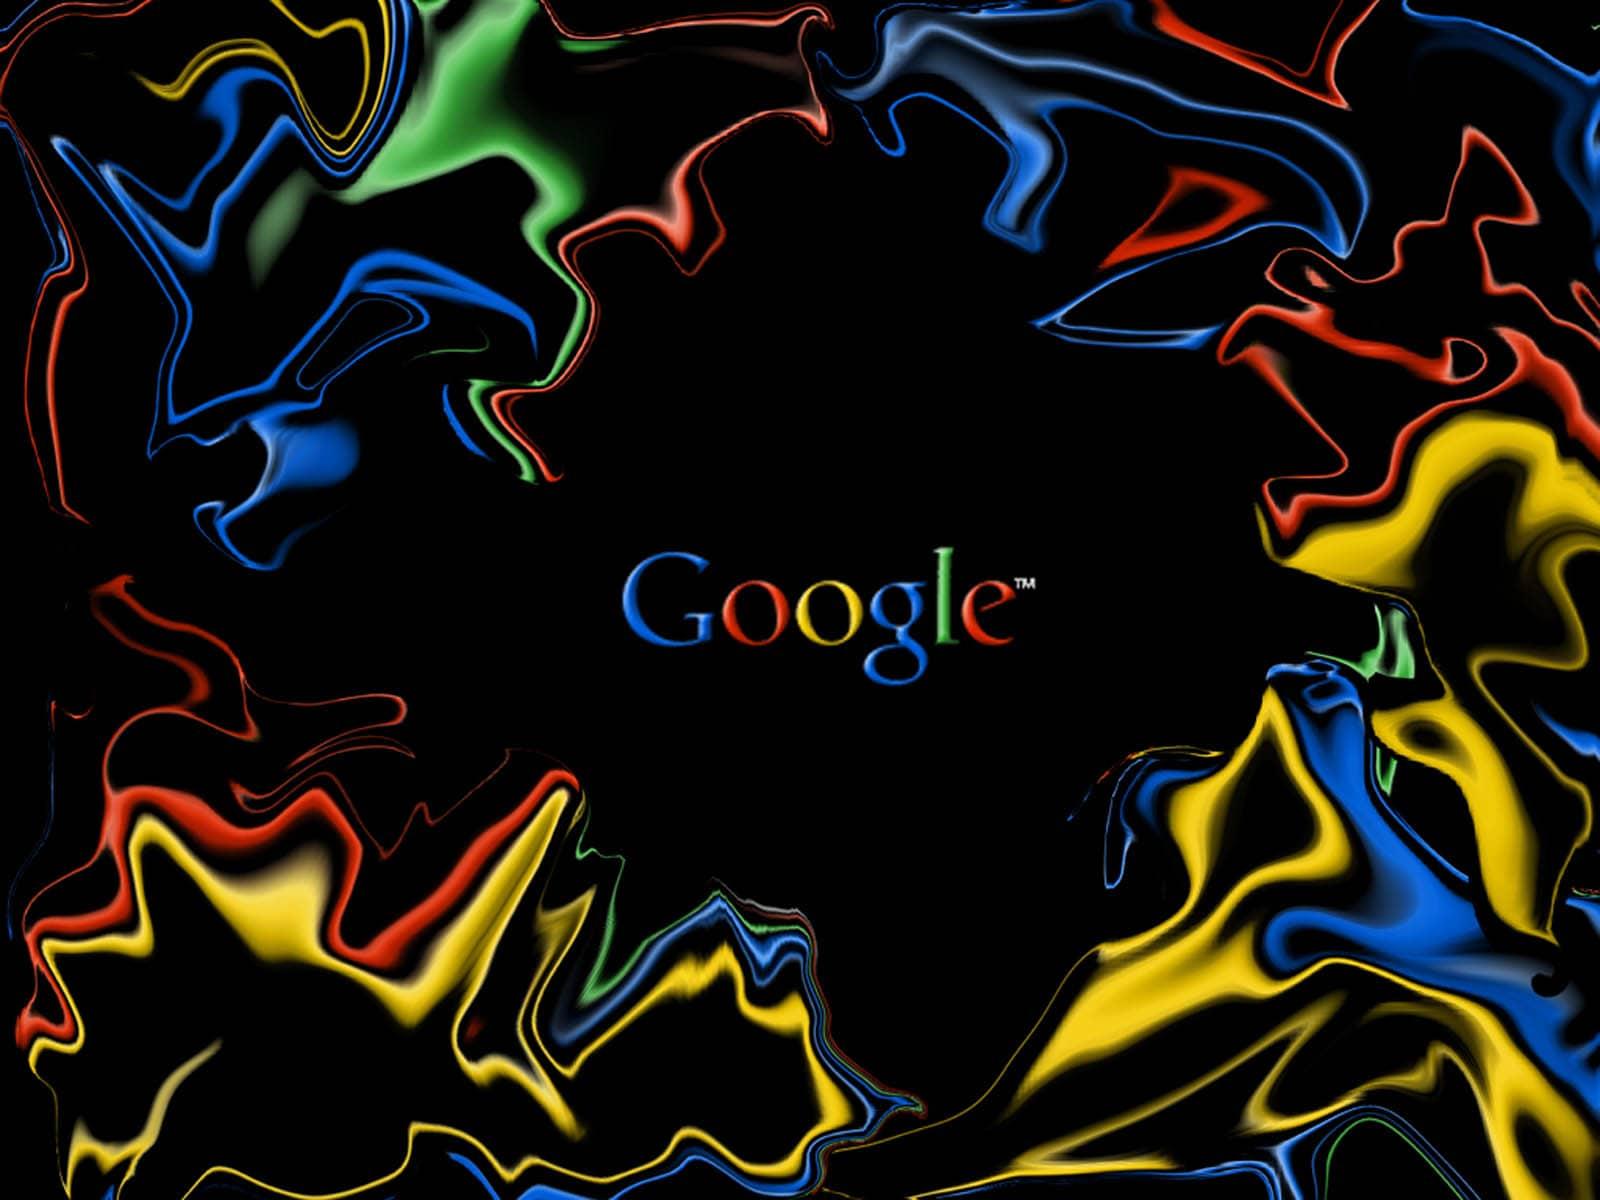 Google Widescreen for desktop